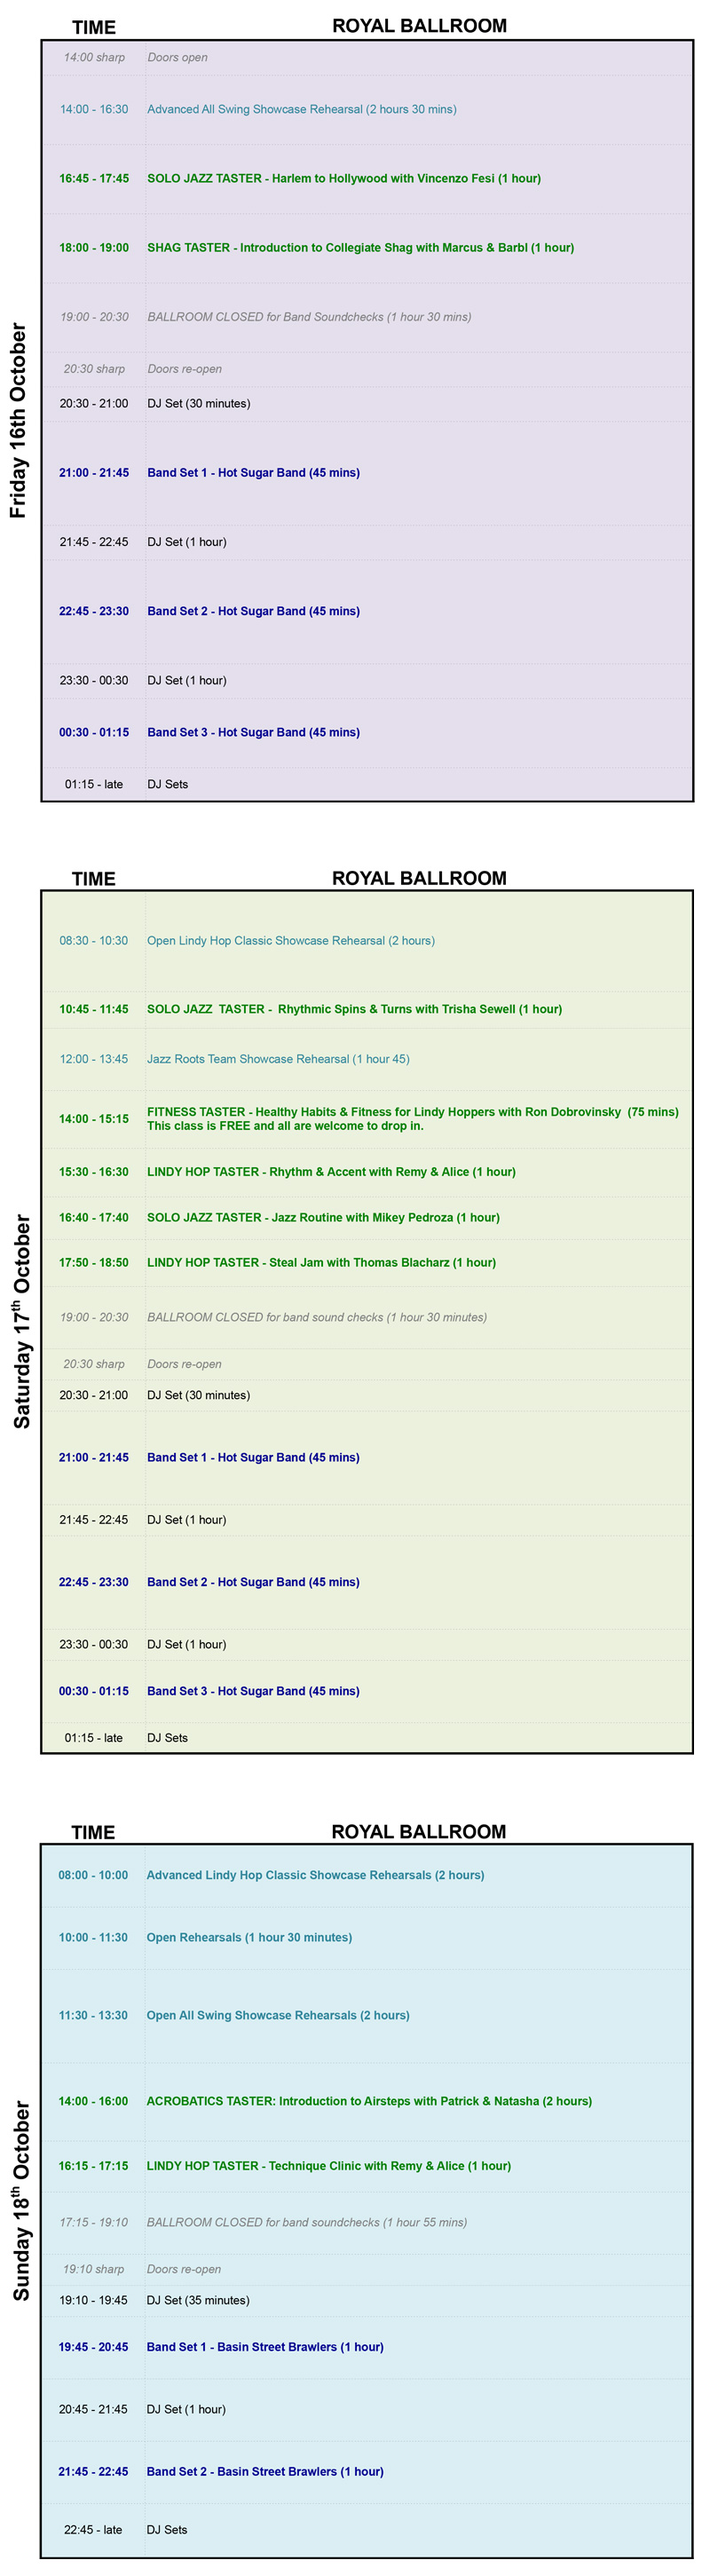 Royal Ballroom Schedule